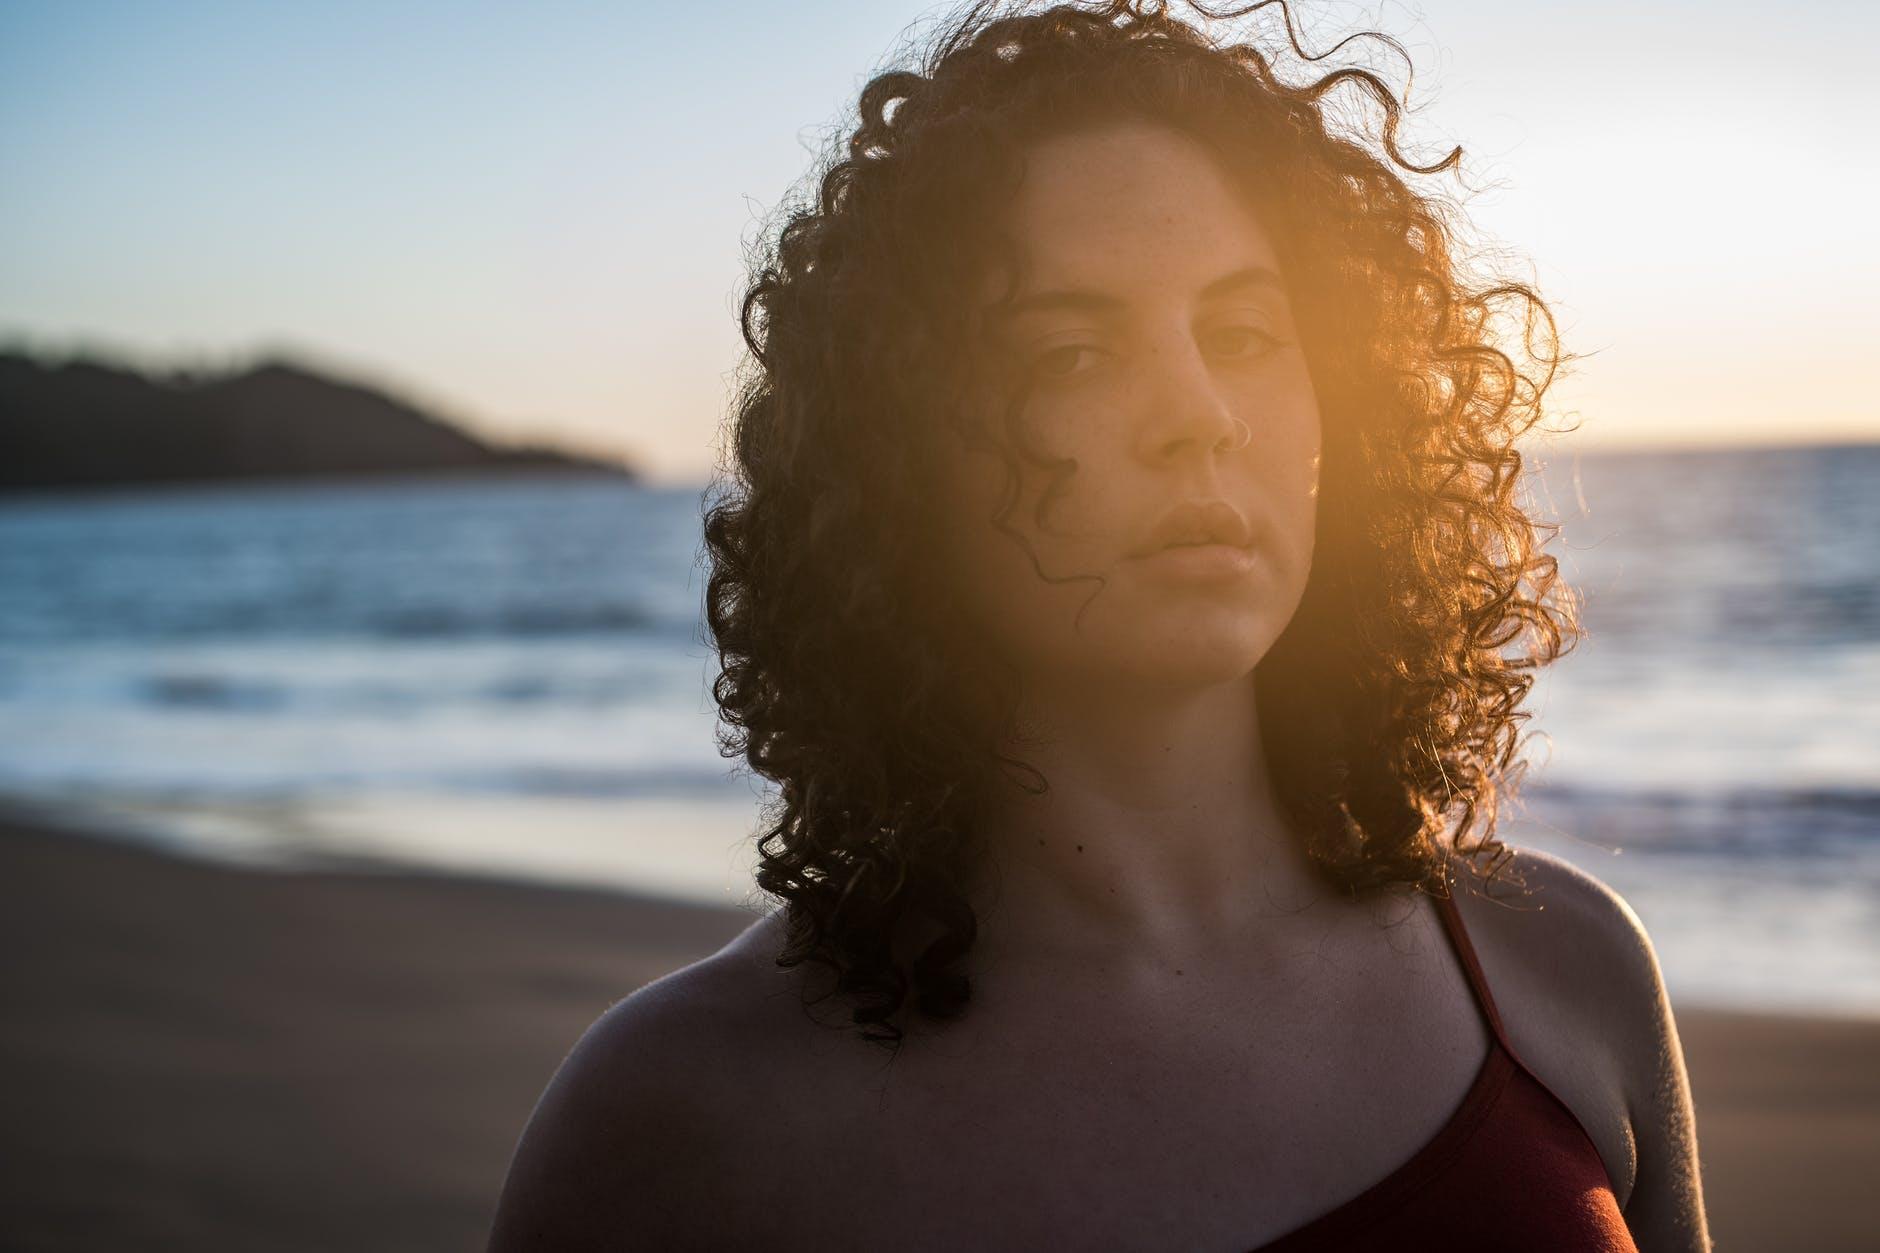 Como proteger o cabelo cacheado do sol